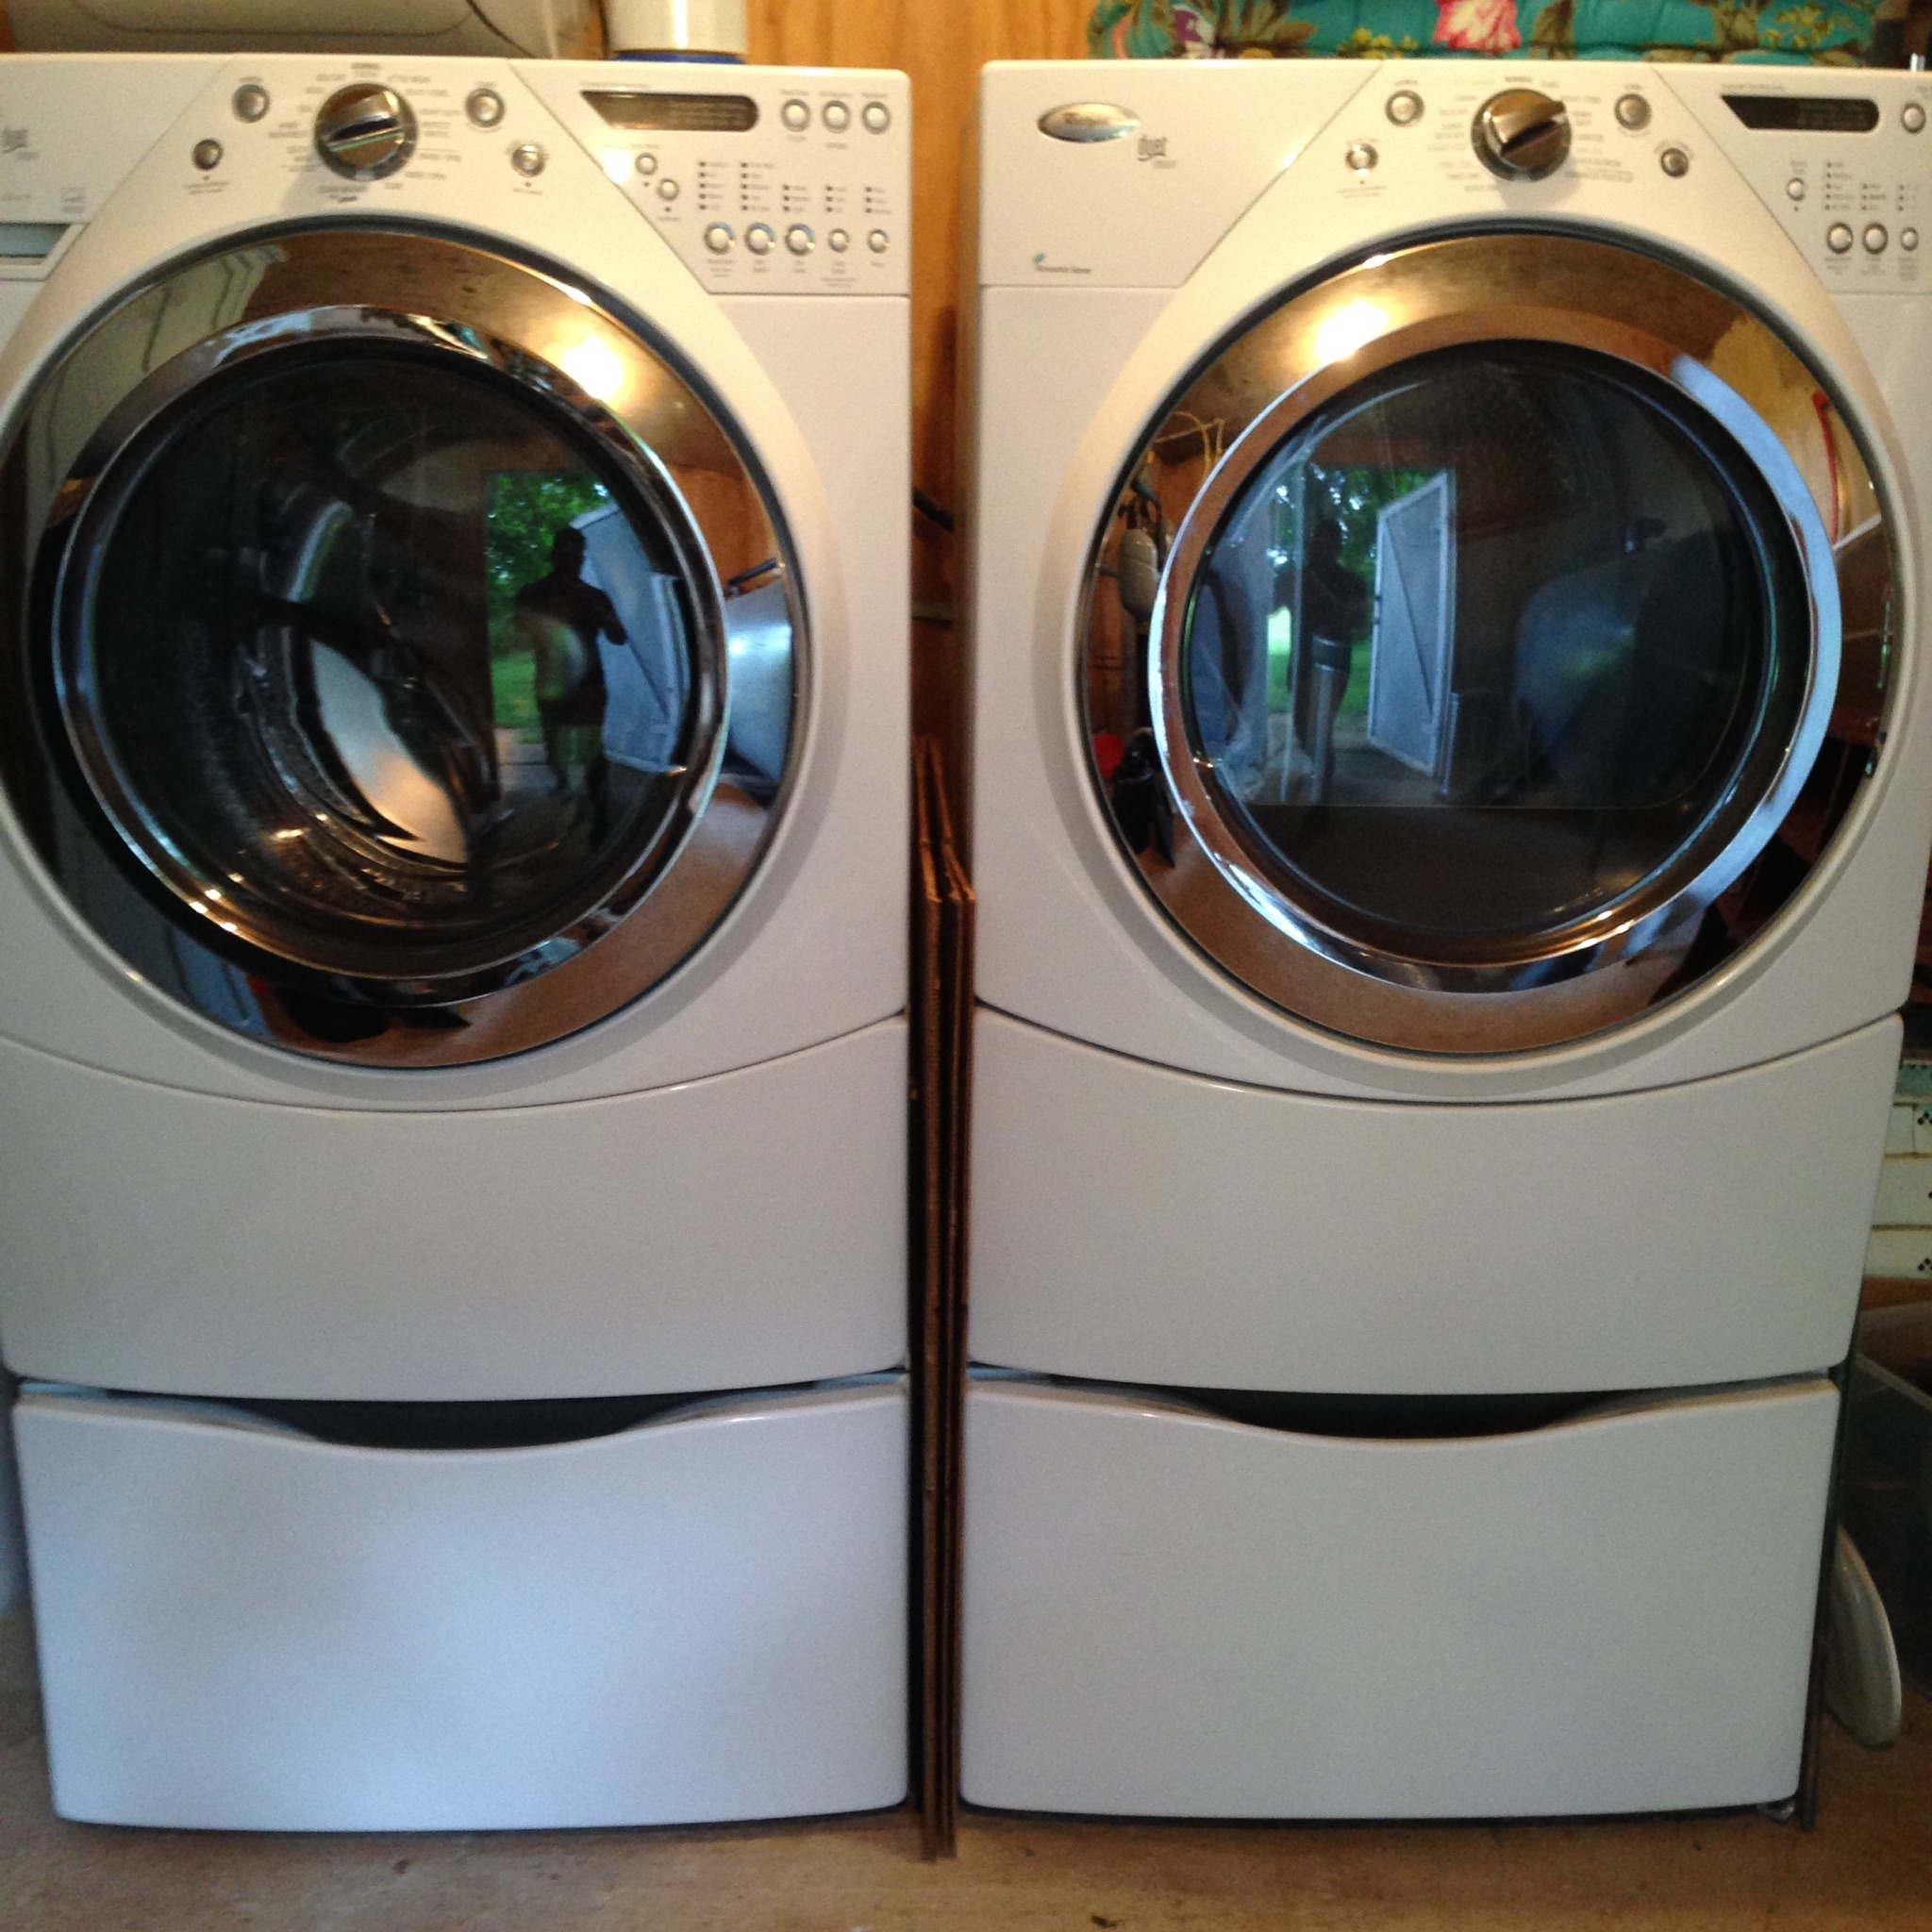 washerndryer.JPG